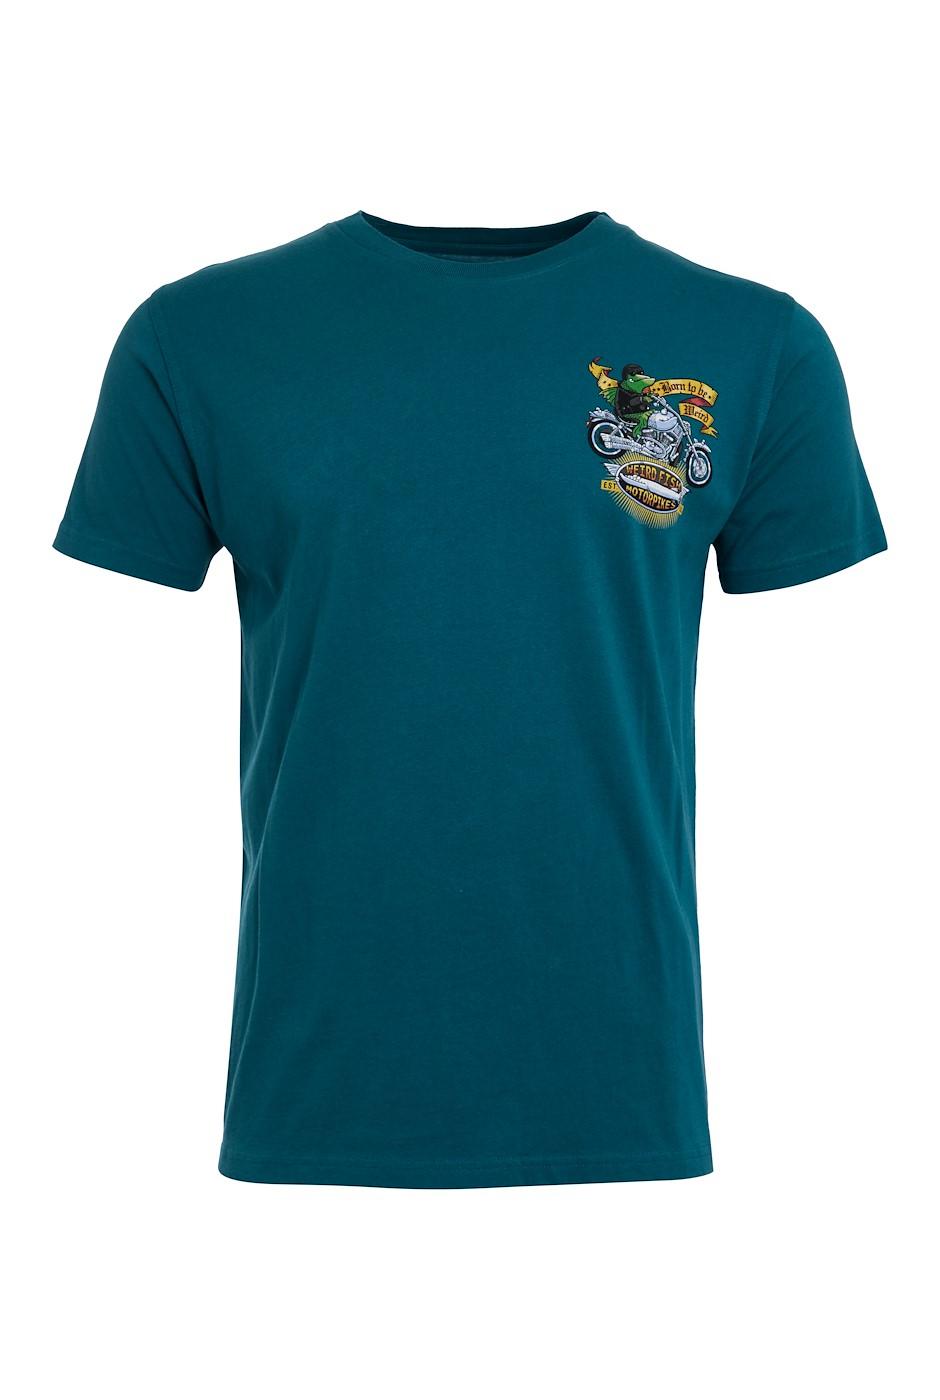 Motorpikes Organic Cotton Artist T-Shirt Petrol Blue